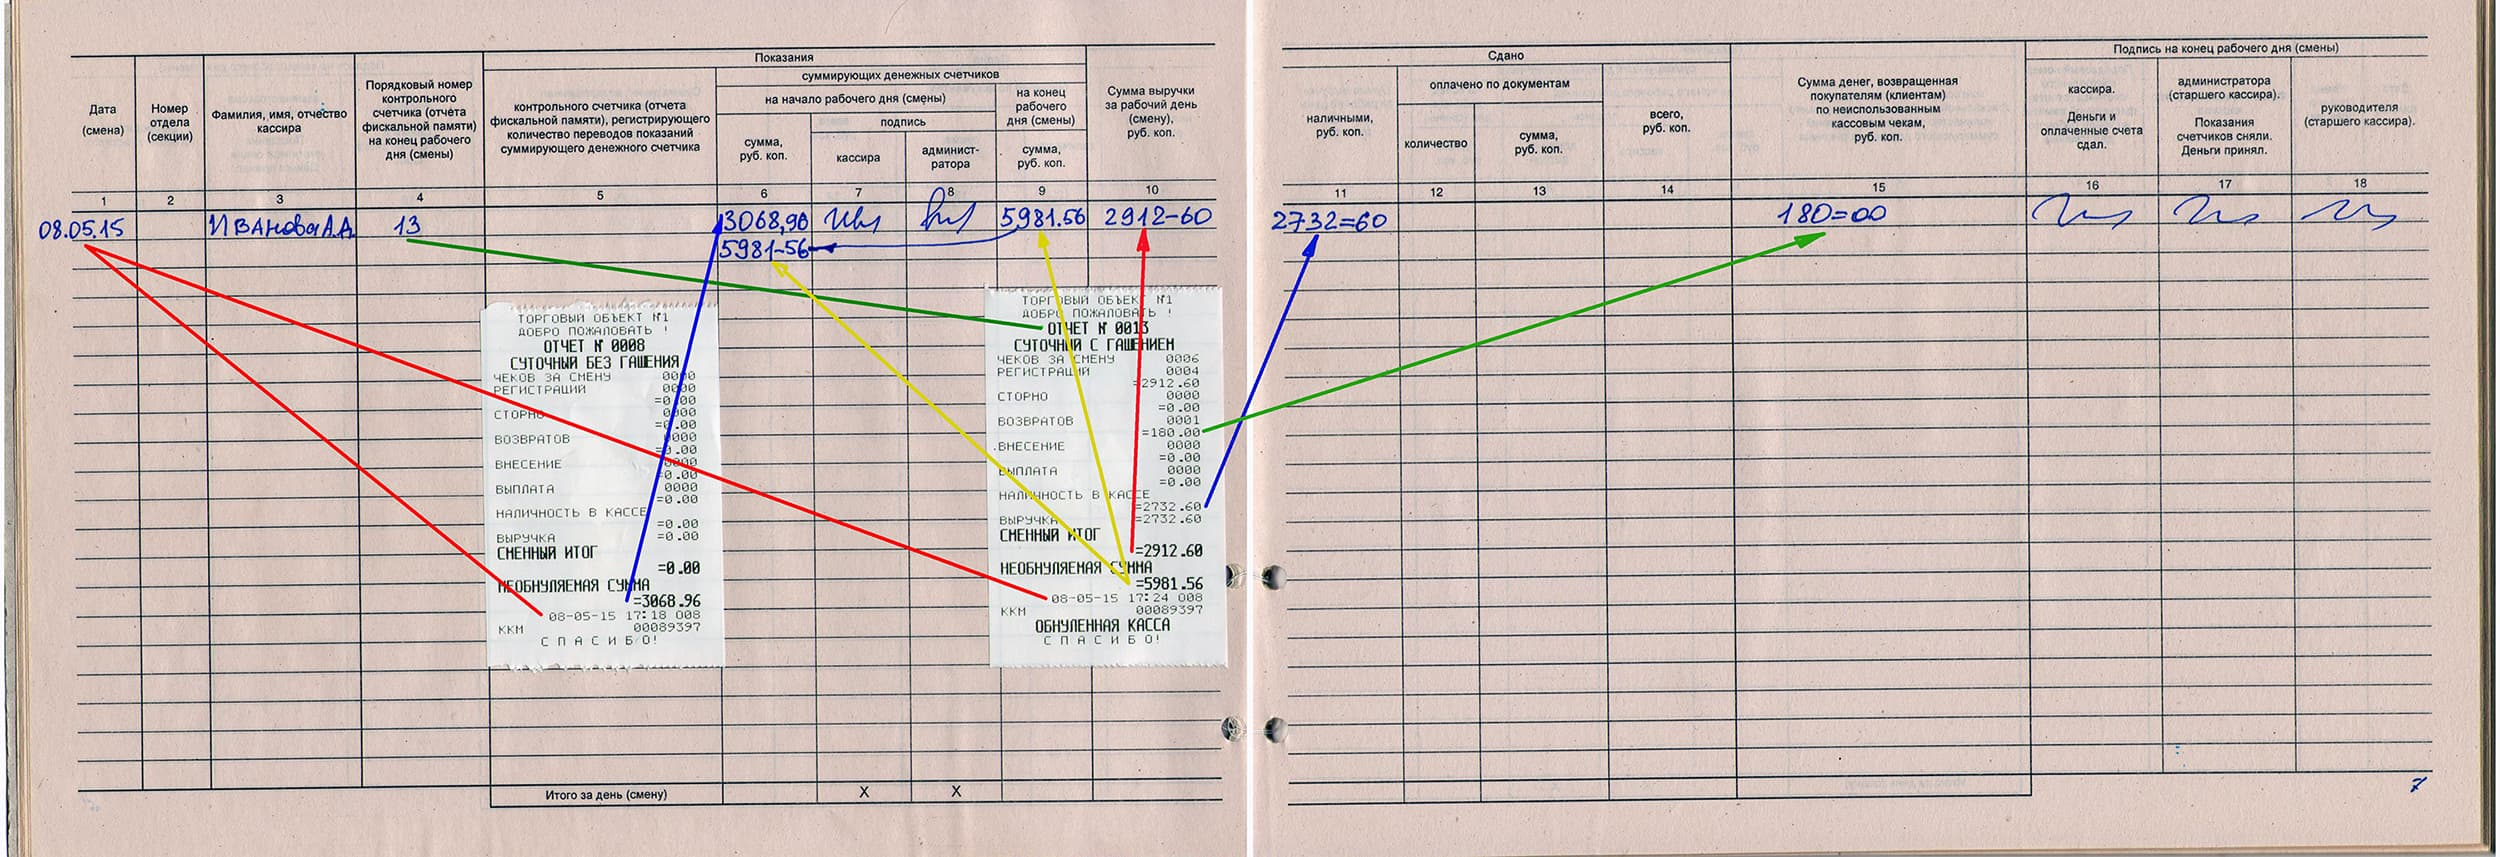 Журнал кассира операциониста Форма КМ правила ведения  Журнал кассира операциониста Элвес МК